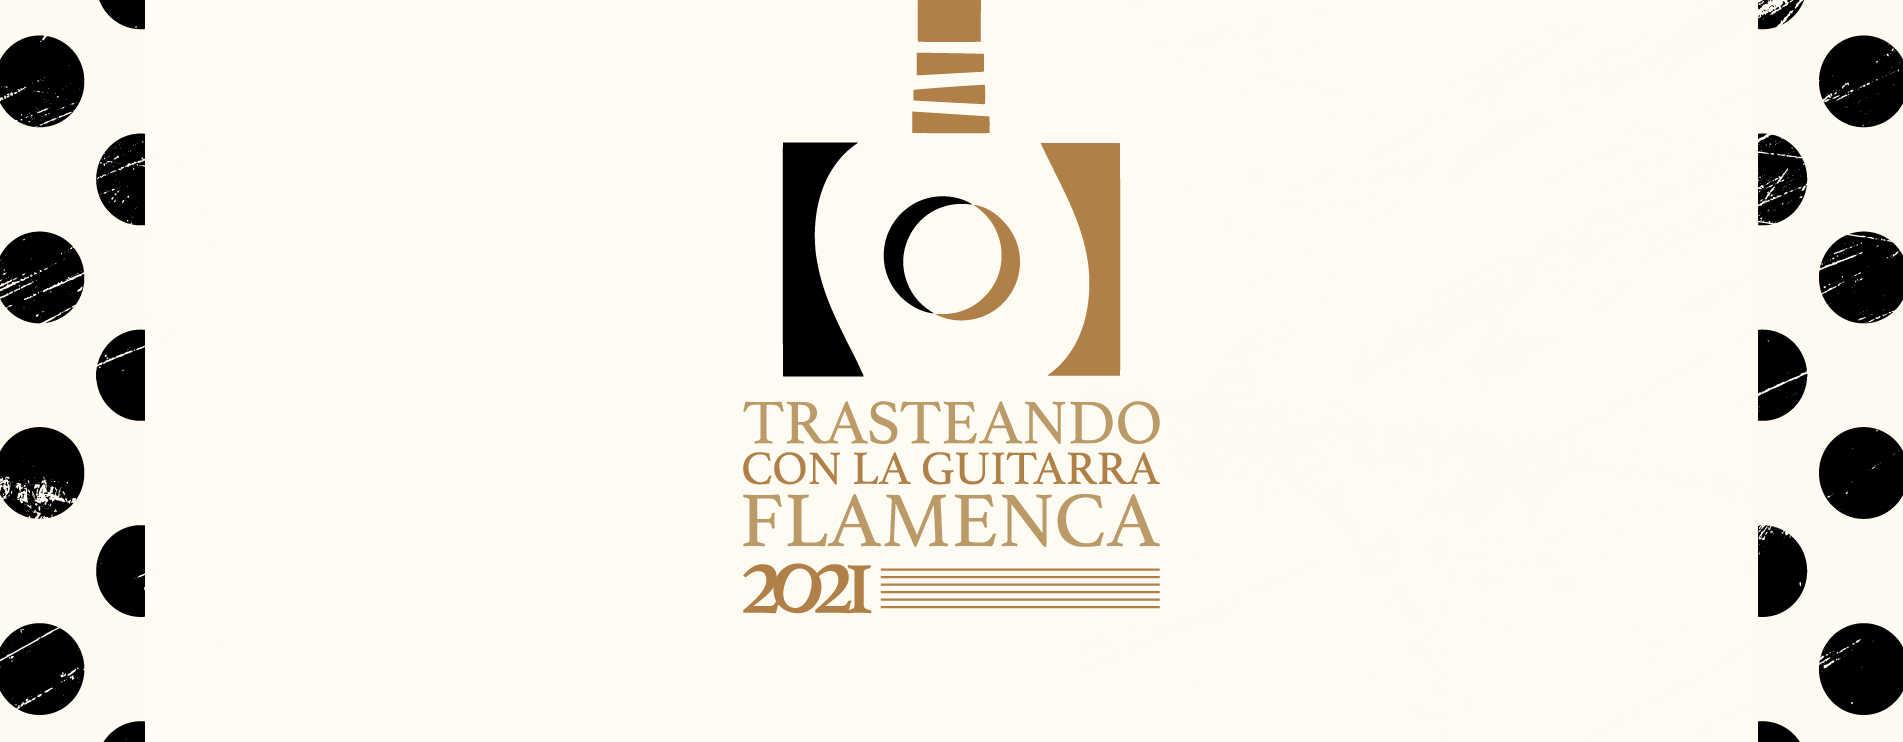 Programa flamenco